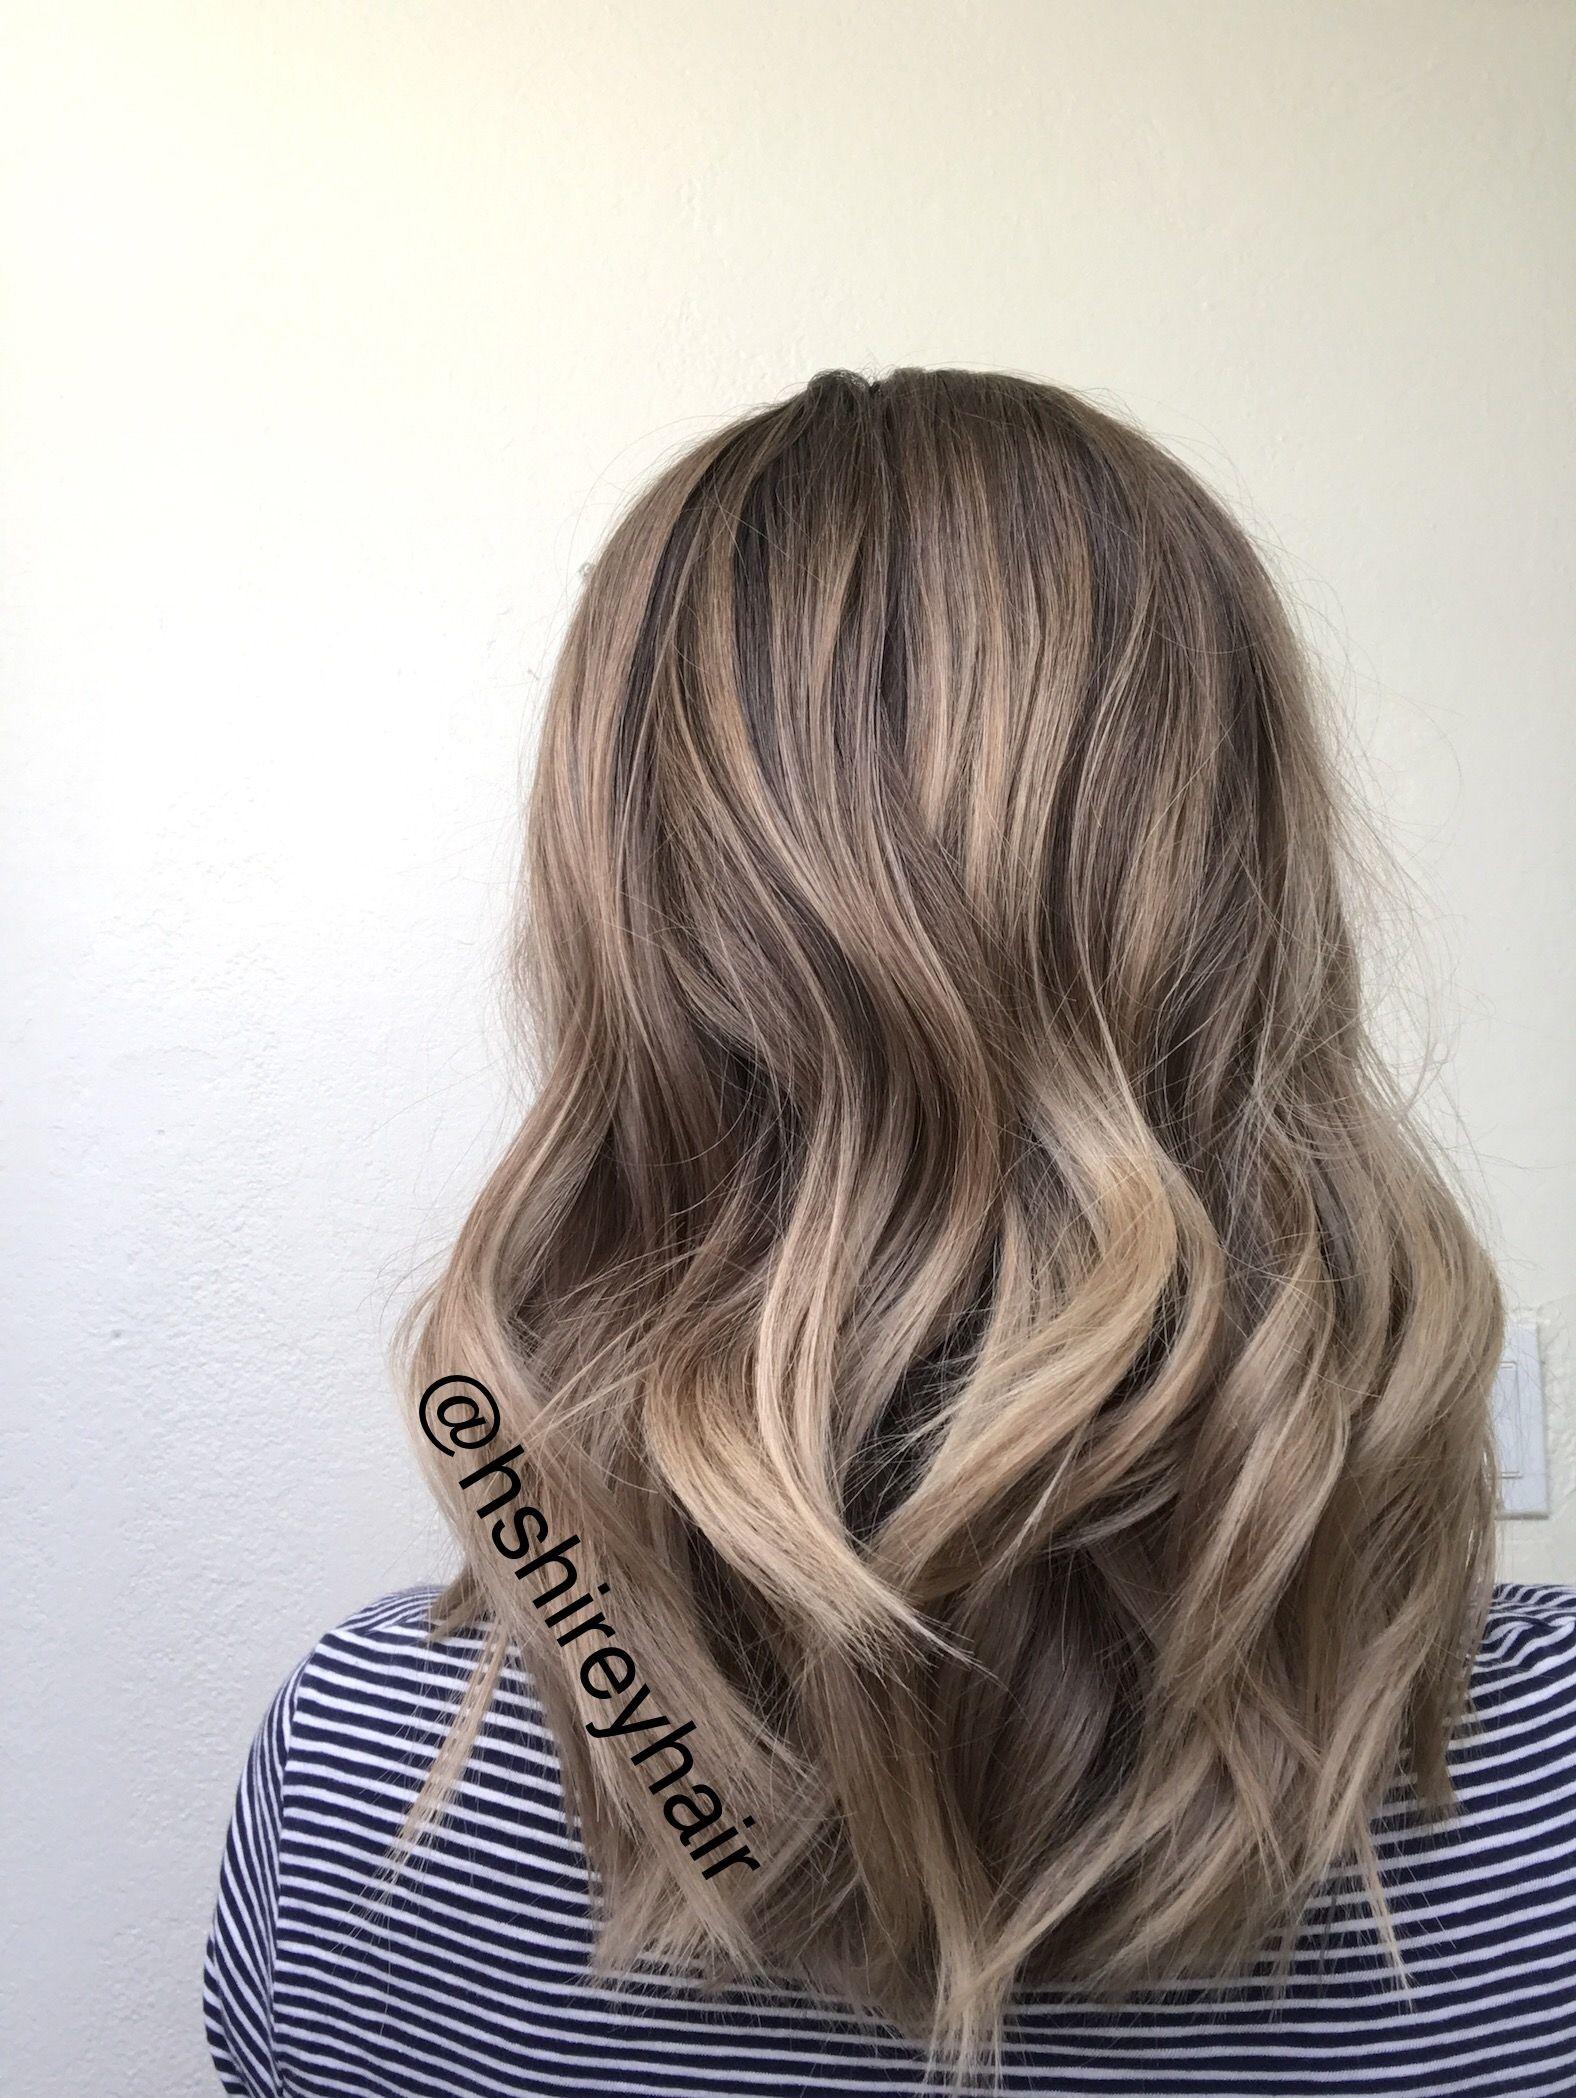 My Hair By Hana Shirey Hshireyhair Dirty Blonde Beige Blonde